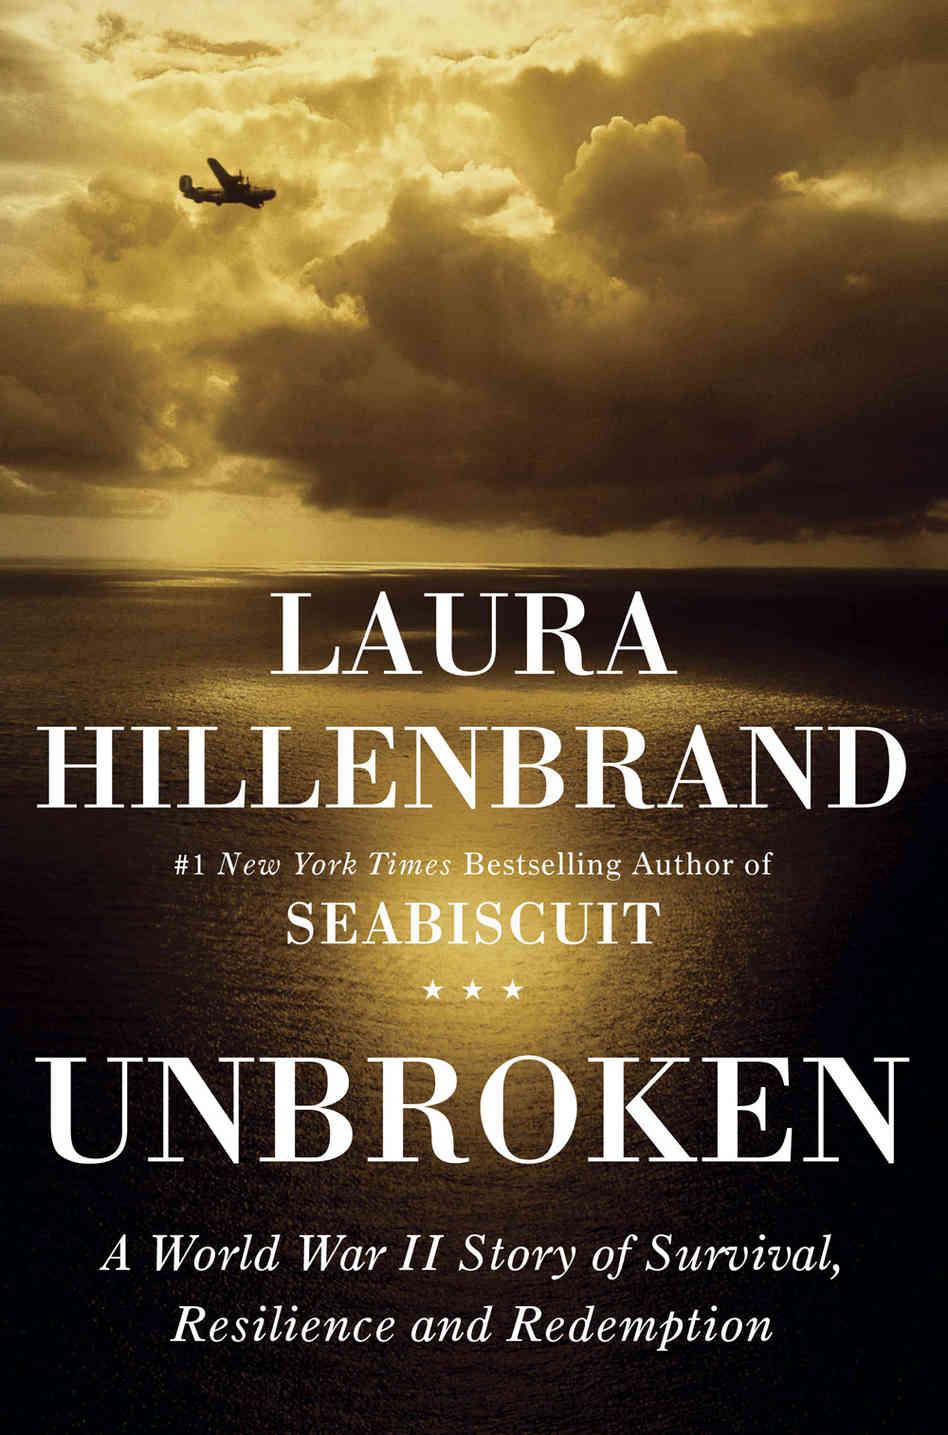 https://i0.wp.com/smithsonianapa.org/bookdragon/wp-content/uploads/sites/10/2011/08/Unbroken.jpg